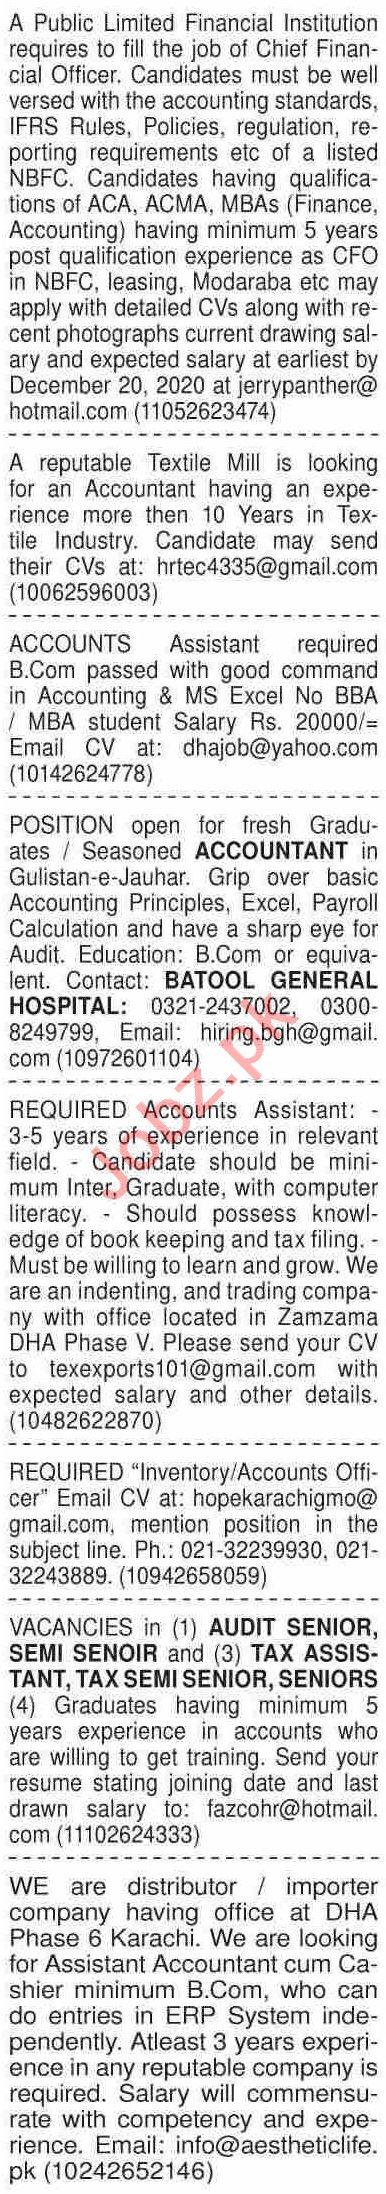 Dawn Sunday Classified Ads 13 Dec 2020 for Accounts Staff